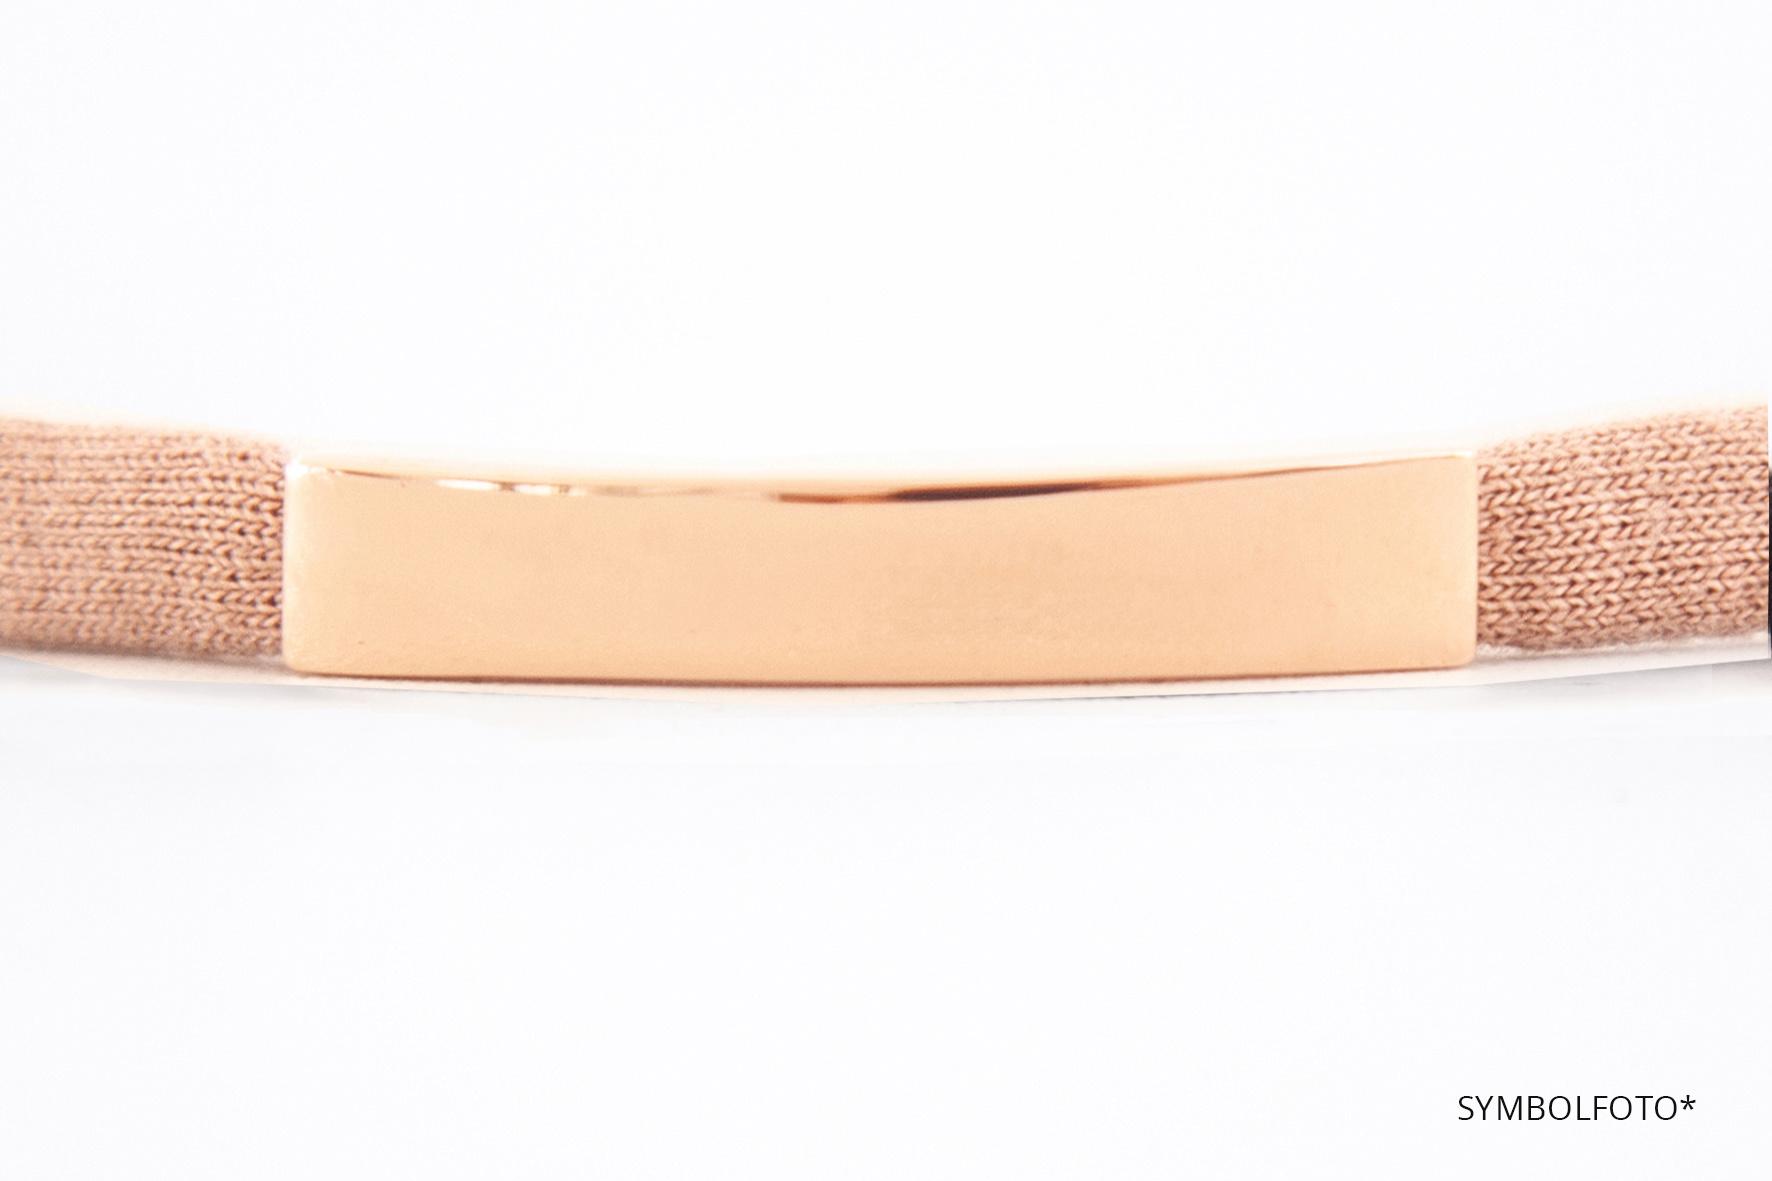 PERSÖNLICHE GRAVUR/ rosegolden glossy /N*dividual